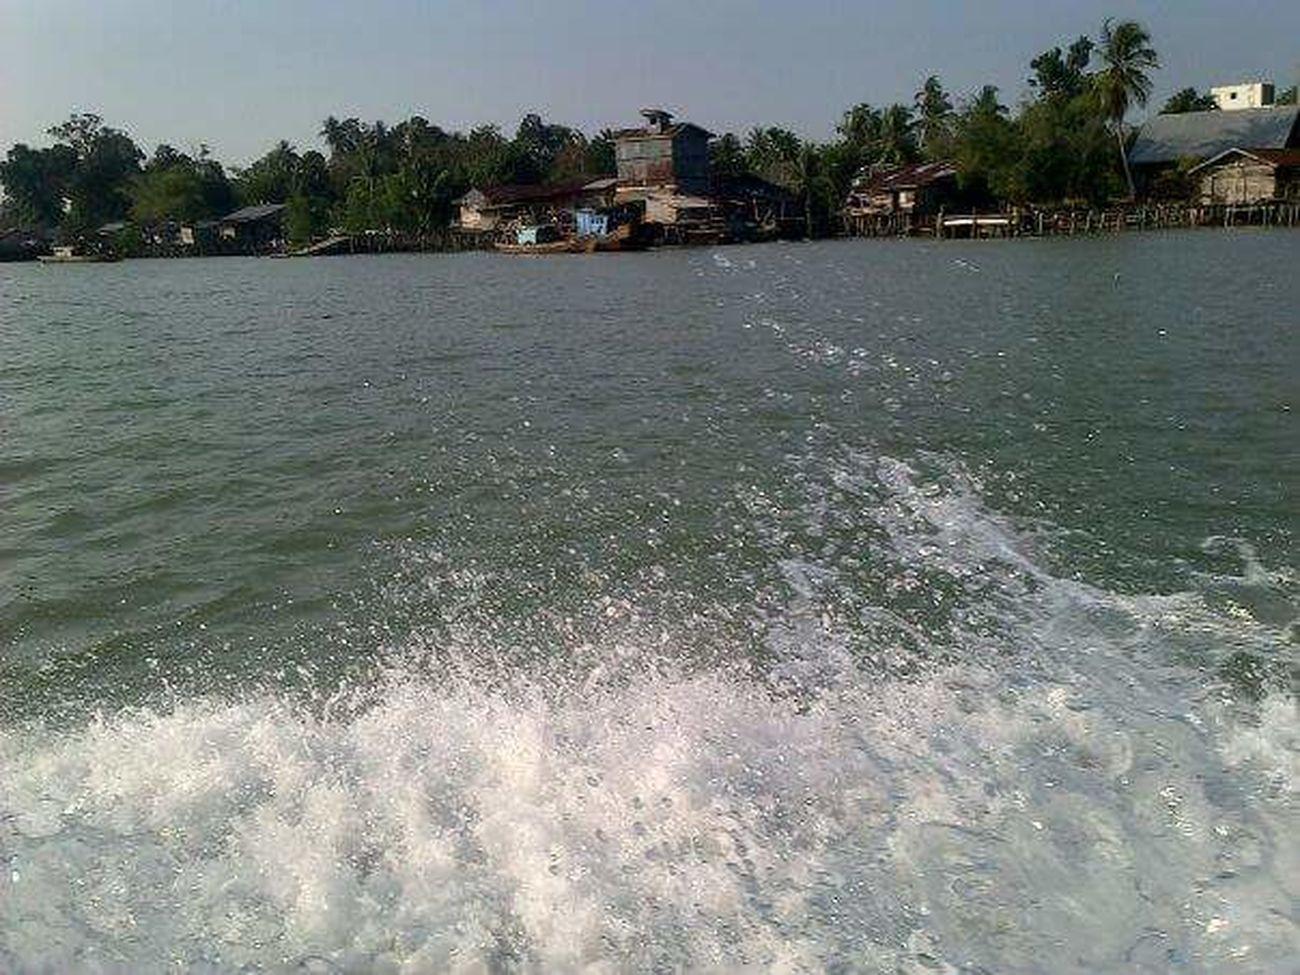 Speedboat River River View Water Village Rupatisland